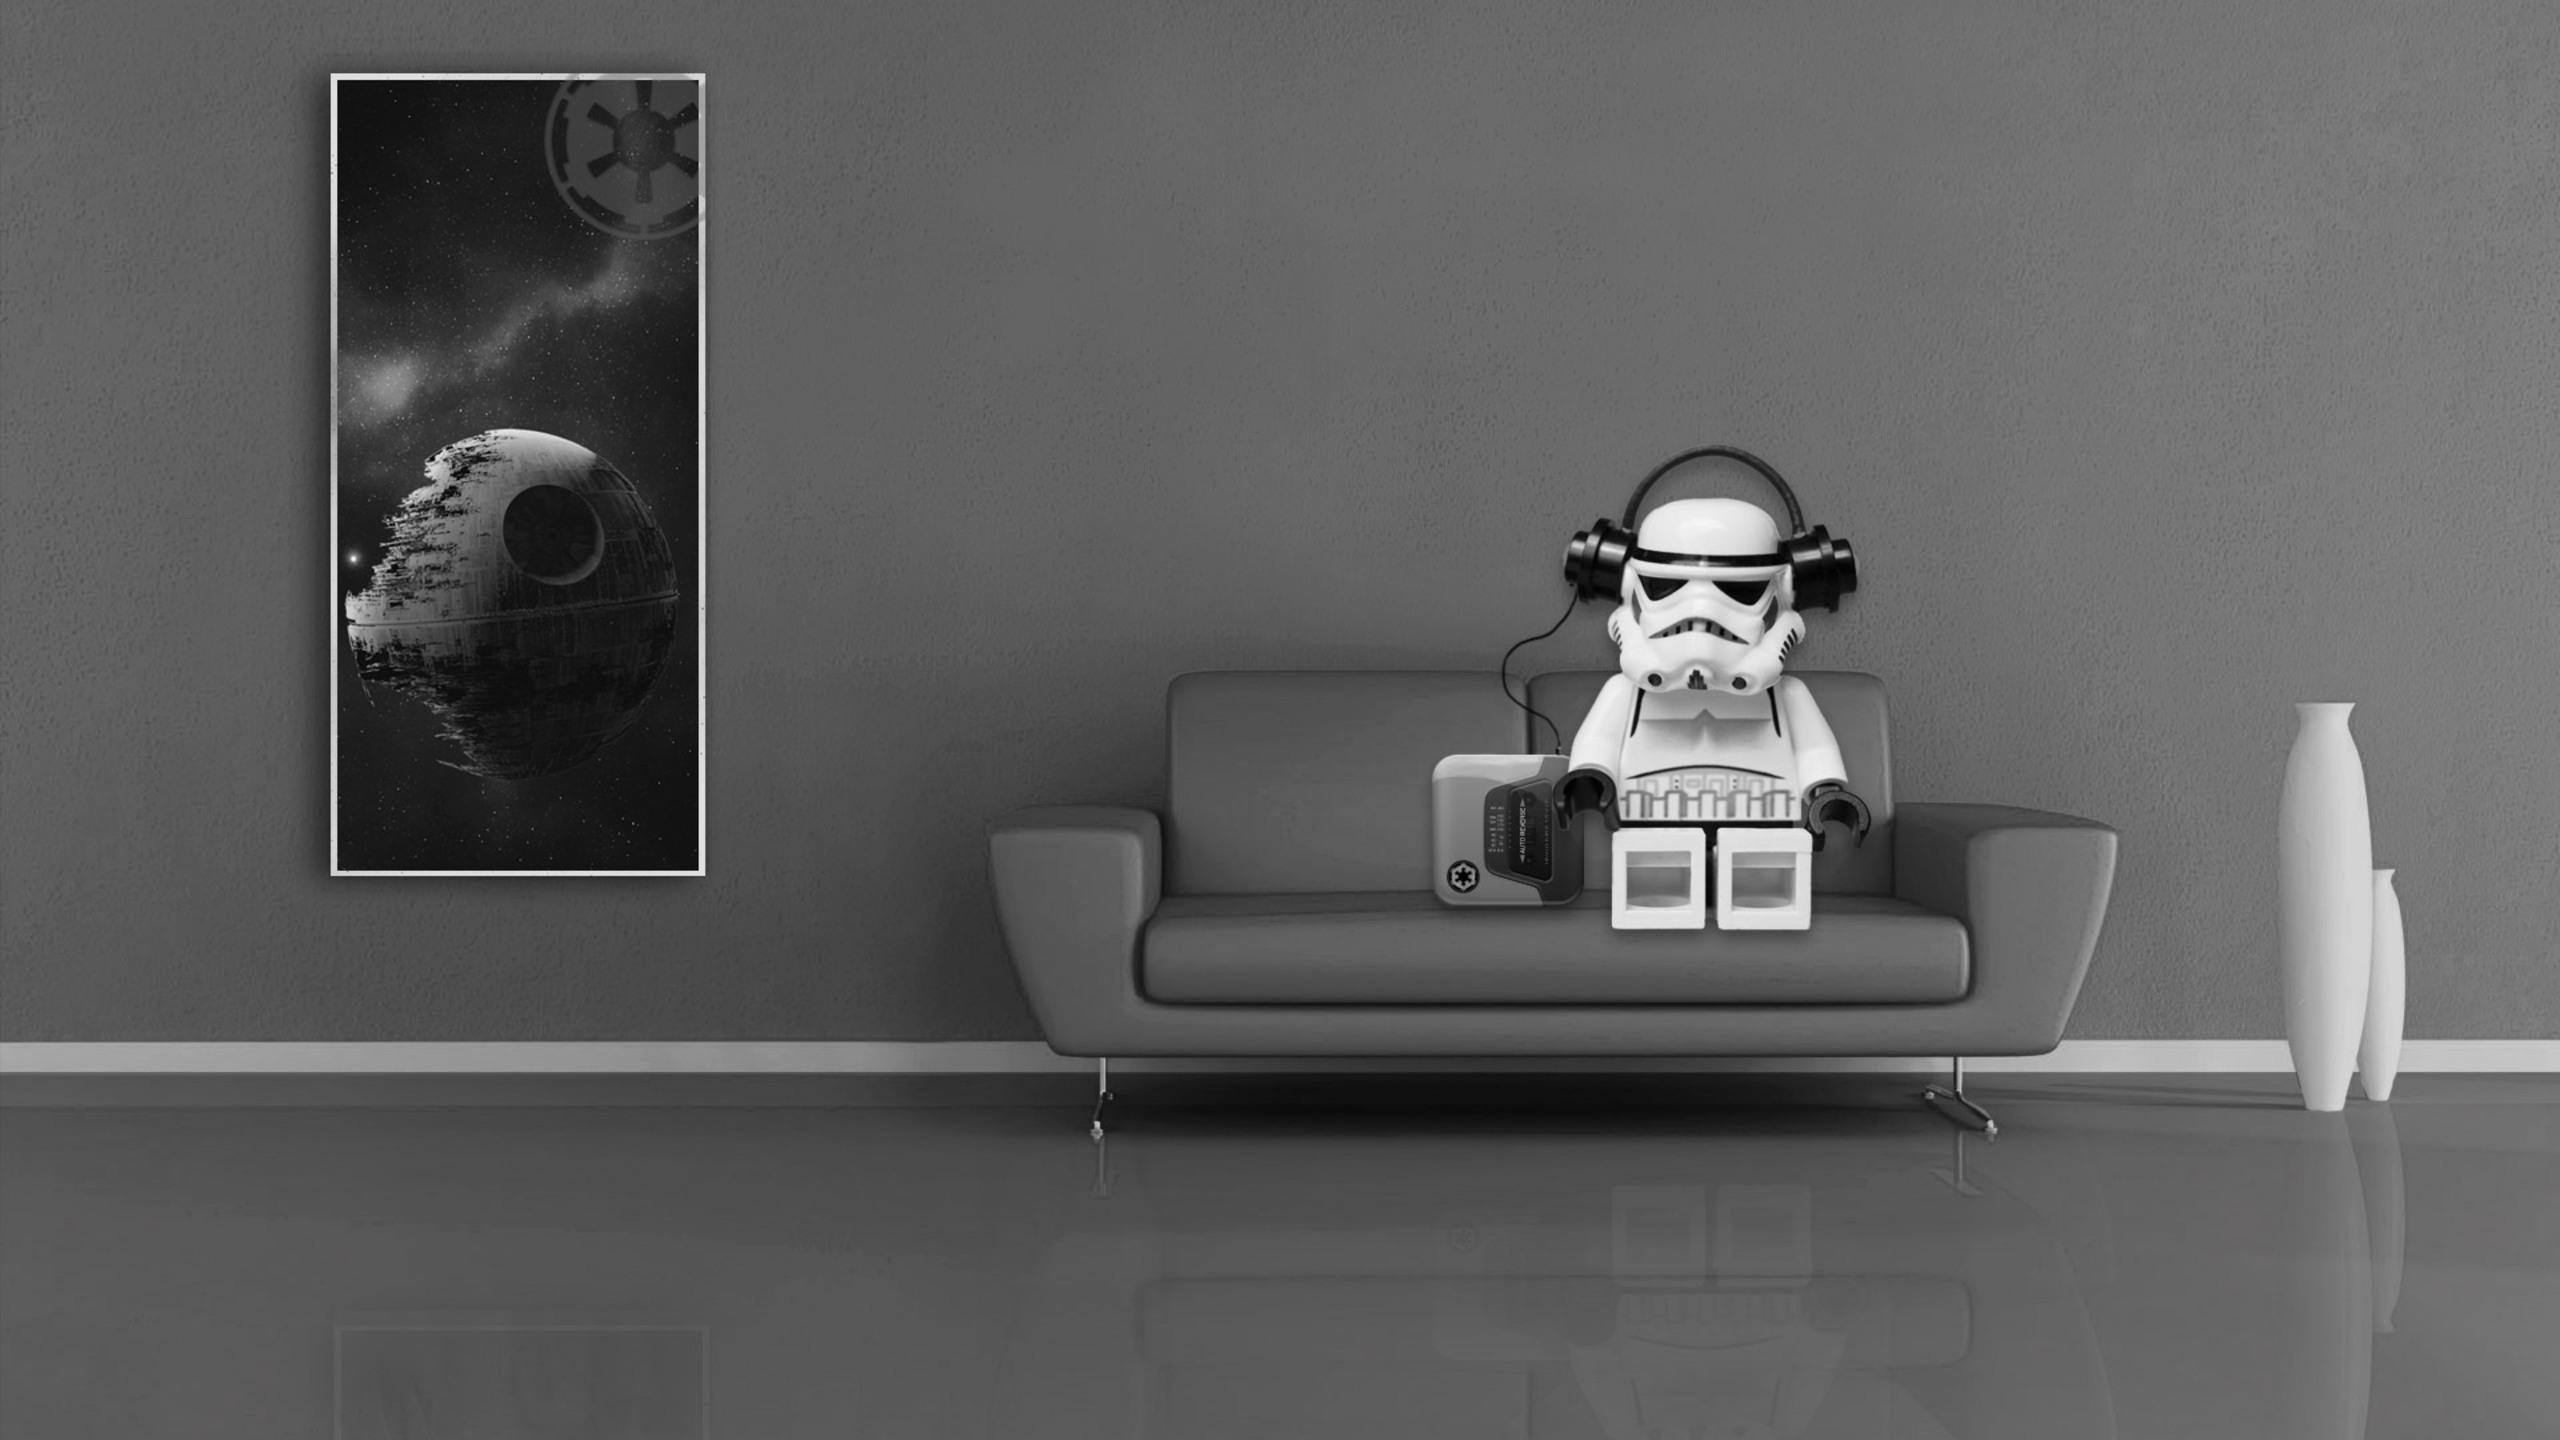 2560x1440 Stormtrooper Lego Star Wars 1440P Resolution HD ...